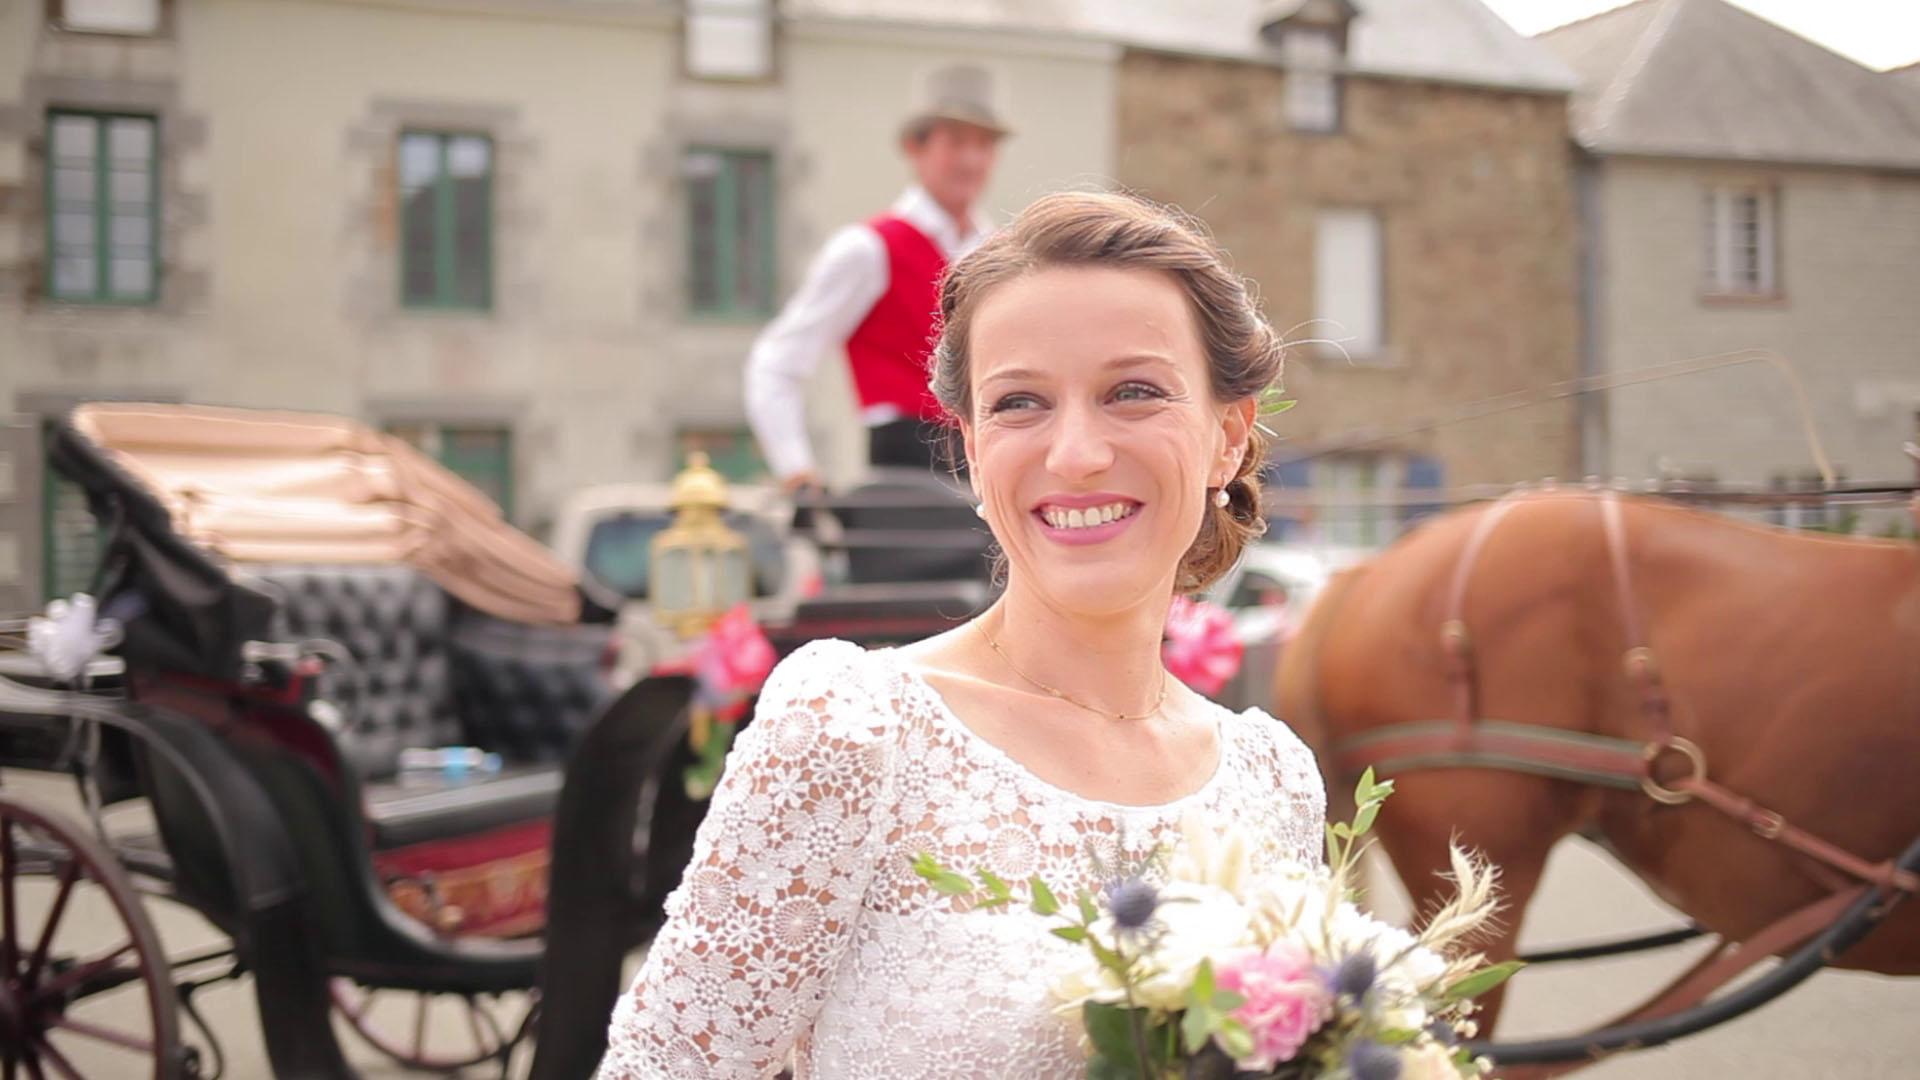 Vidéo mariage Rennes | Un Mariage, Une Histoire